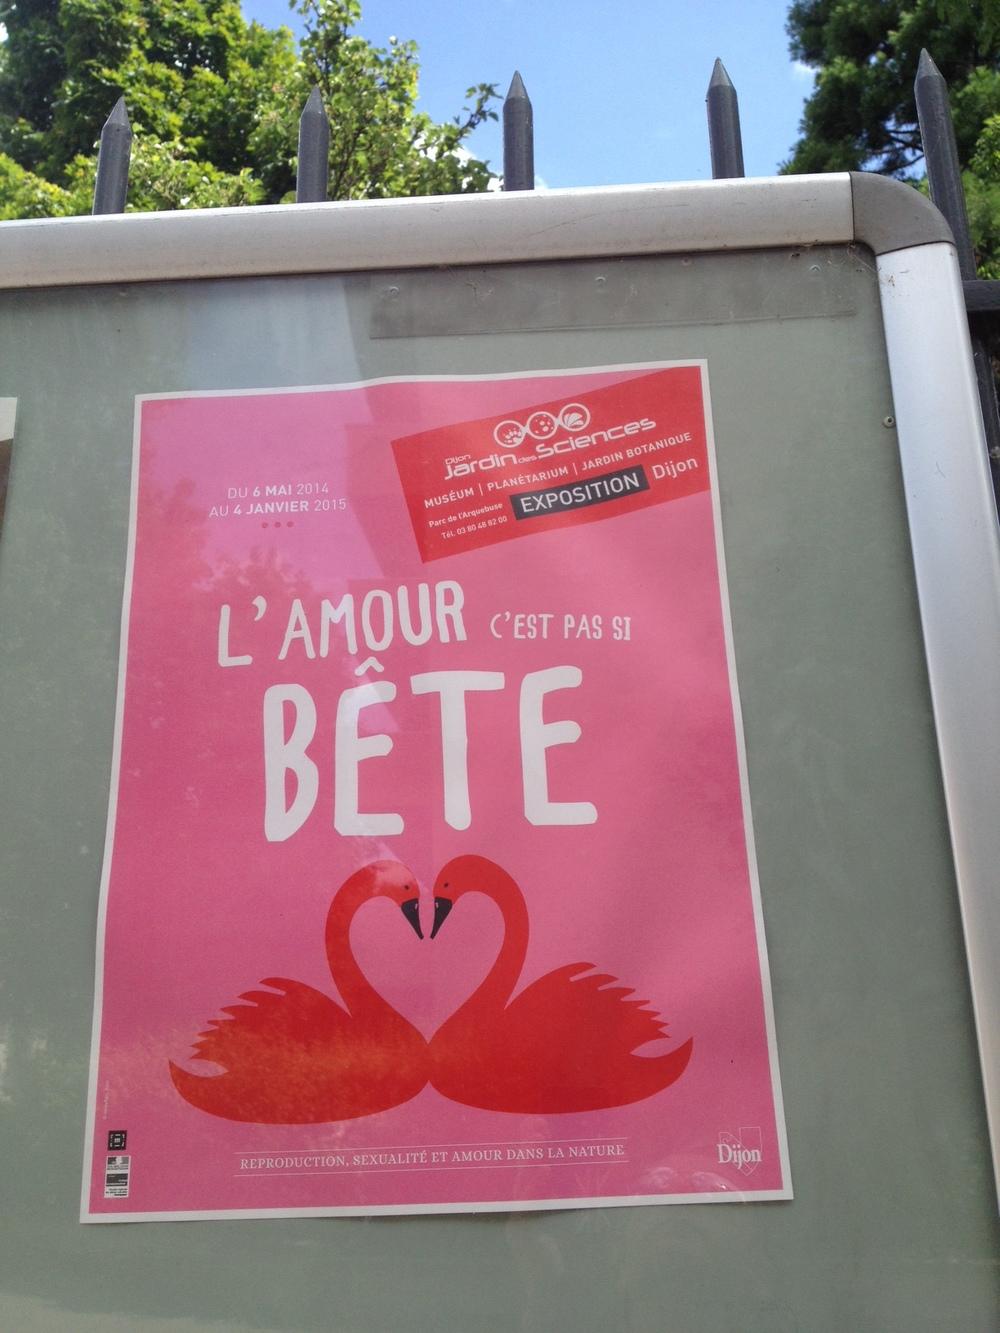 Arquebuse Dijon June 2014a.JPG